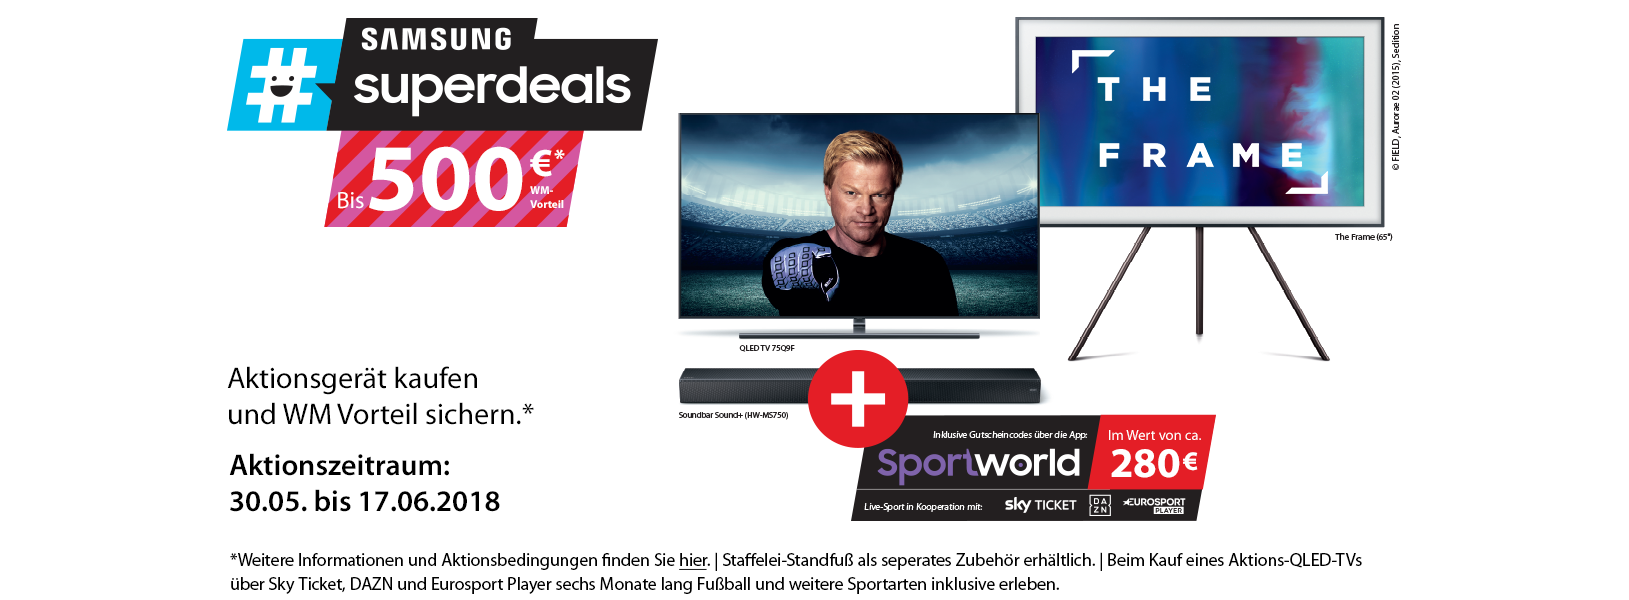 Samsung #superdeals